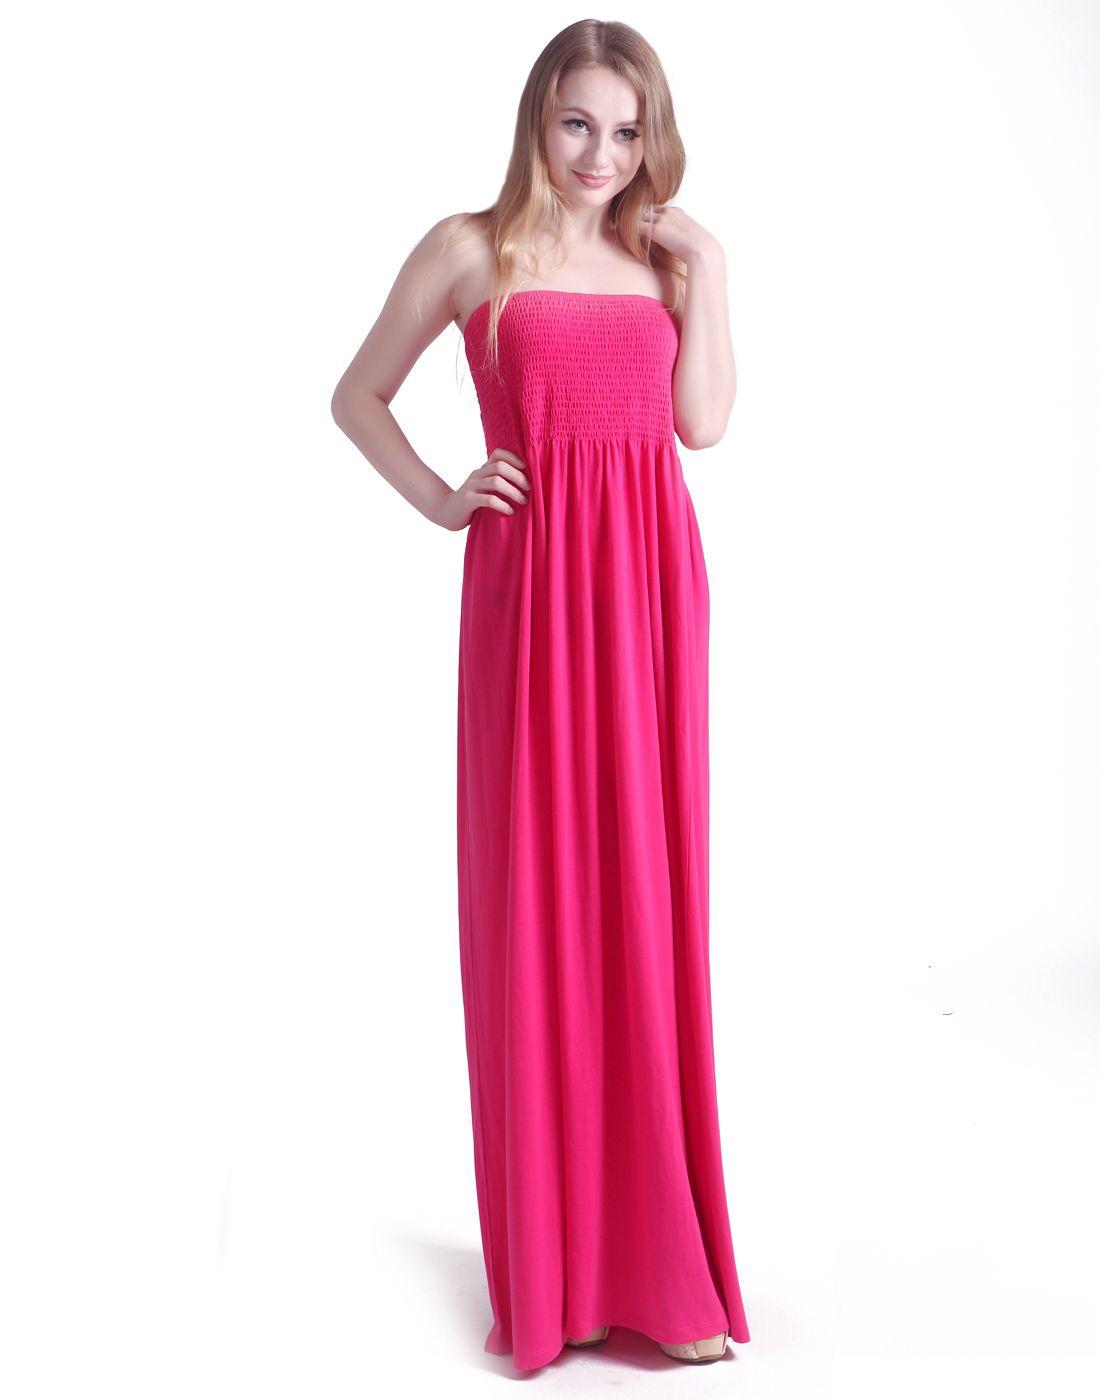 c6b22473d5b HDE Women s Strapless Maxi Dress Tube Top Long Skirt Sundress Cover Up Maxi